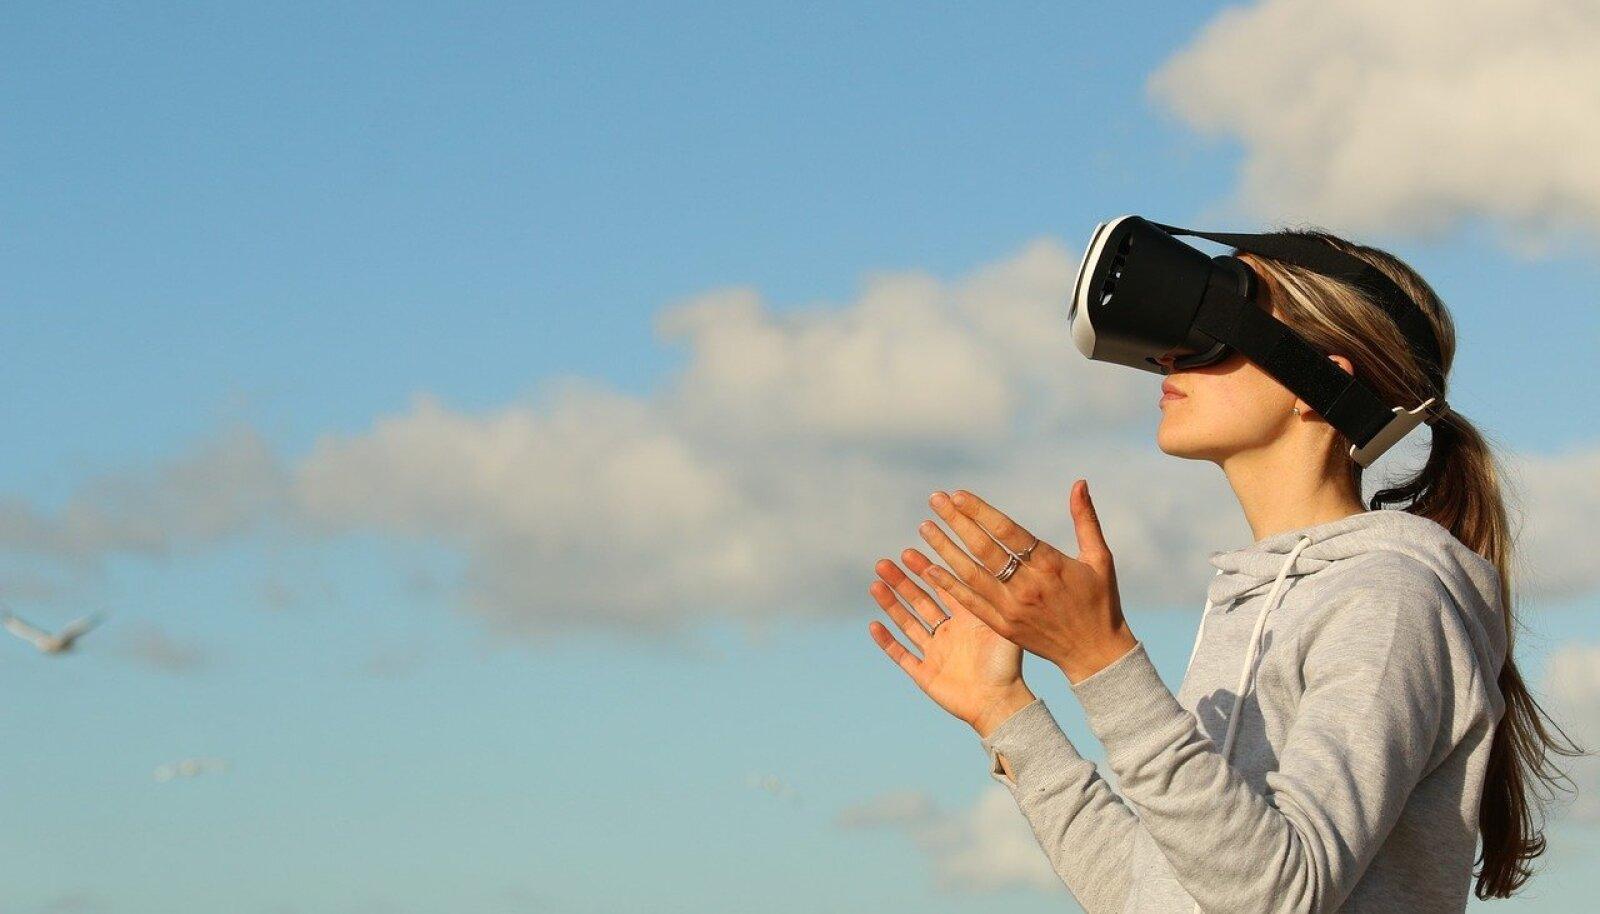 Virtuaalne reaalsus (VR)